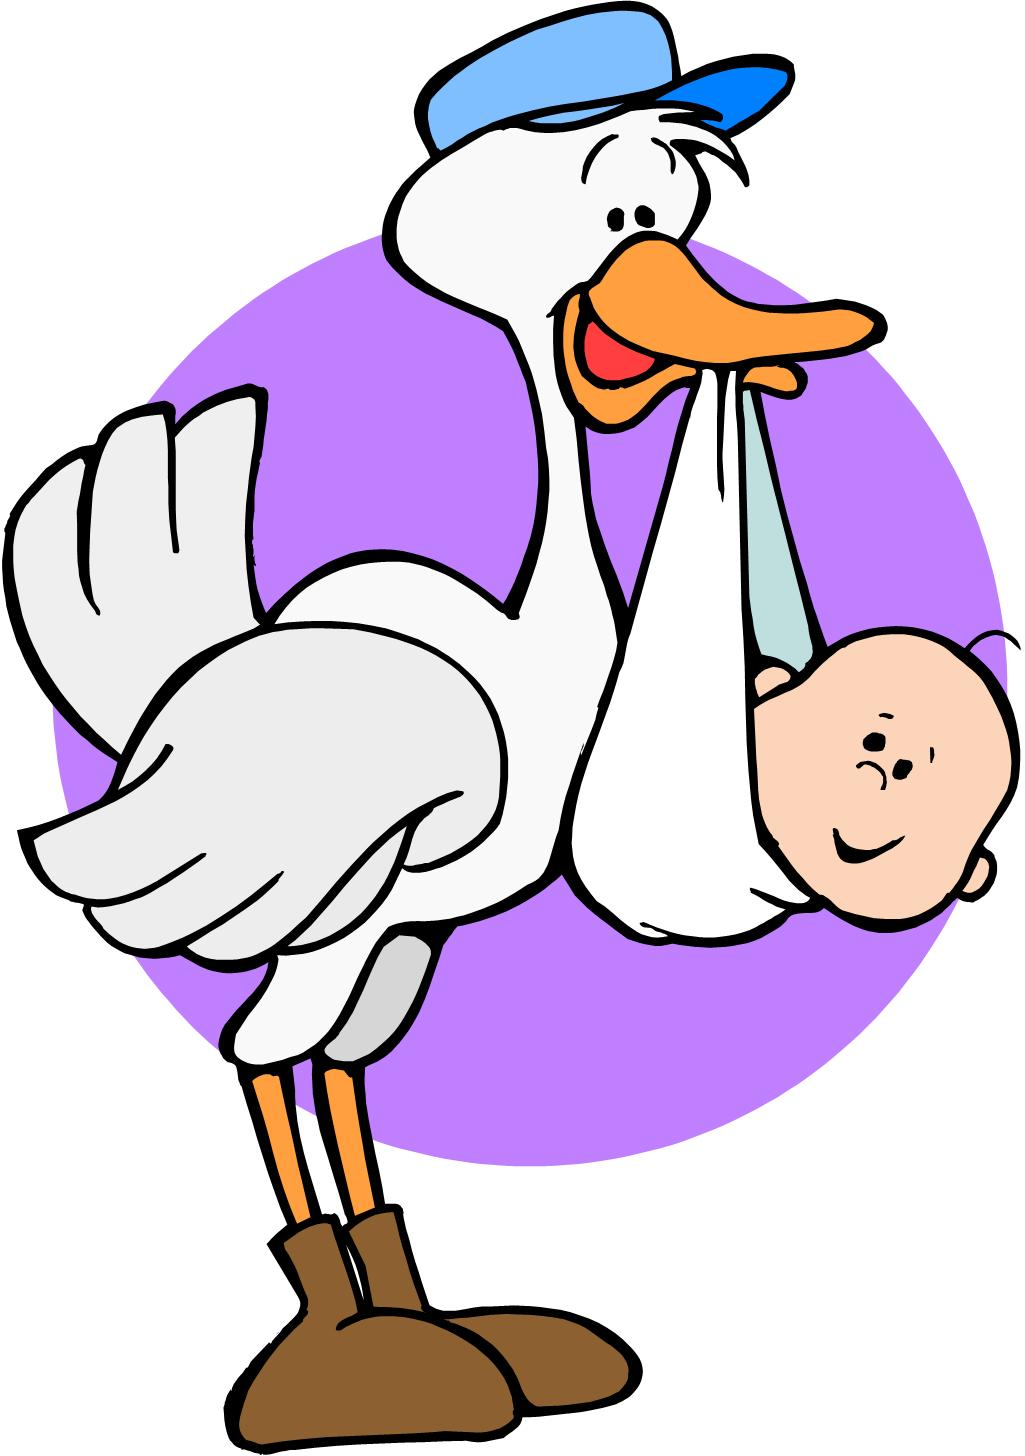 1025x1456 Czeshop Images Baby Delivery Clipart